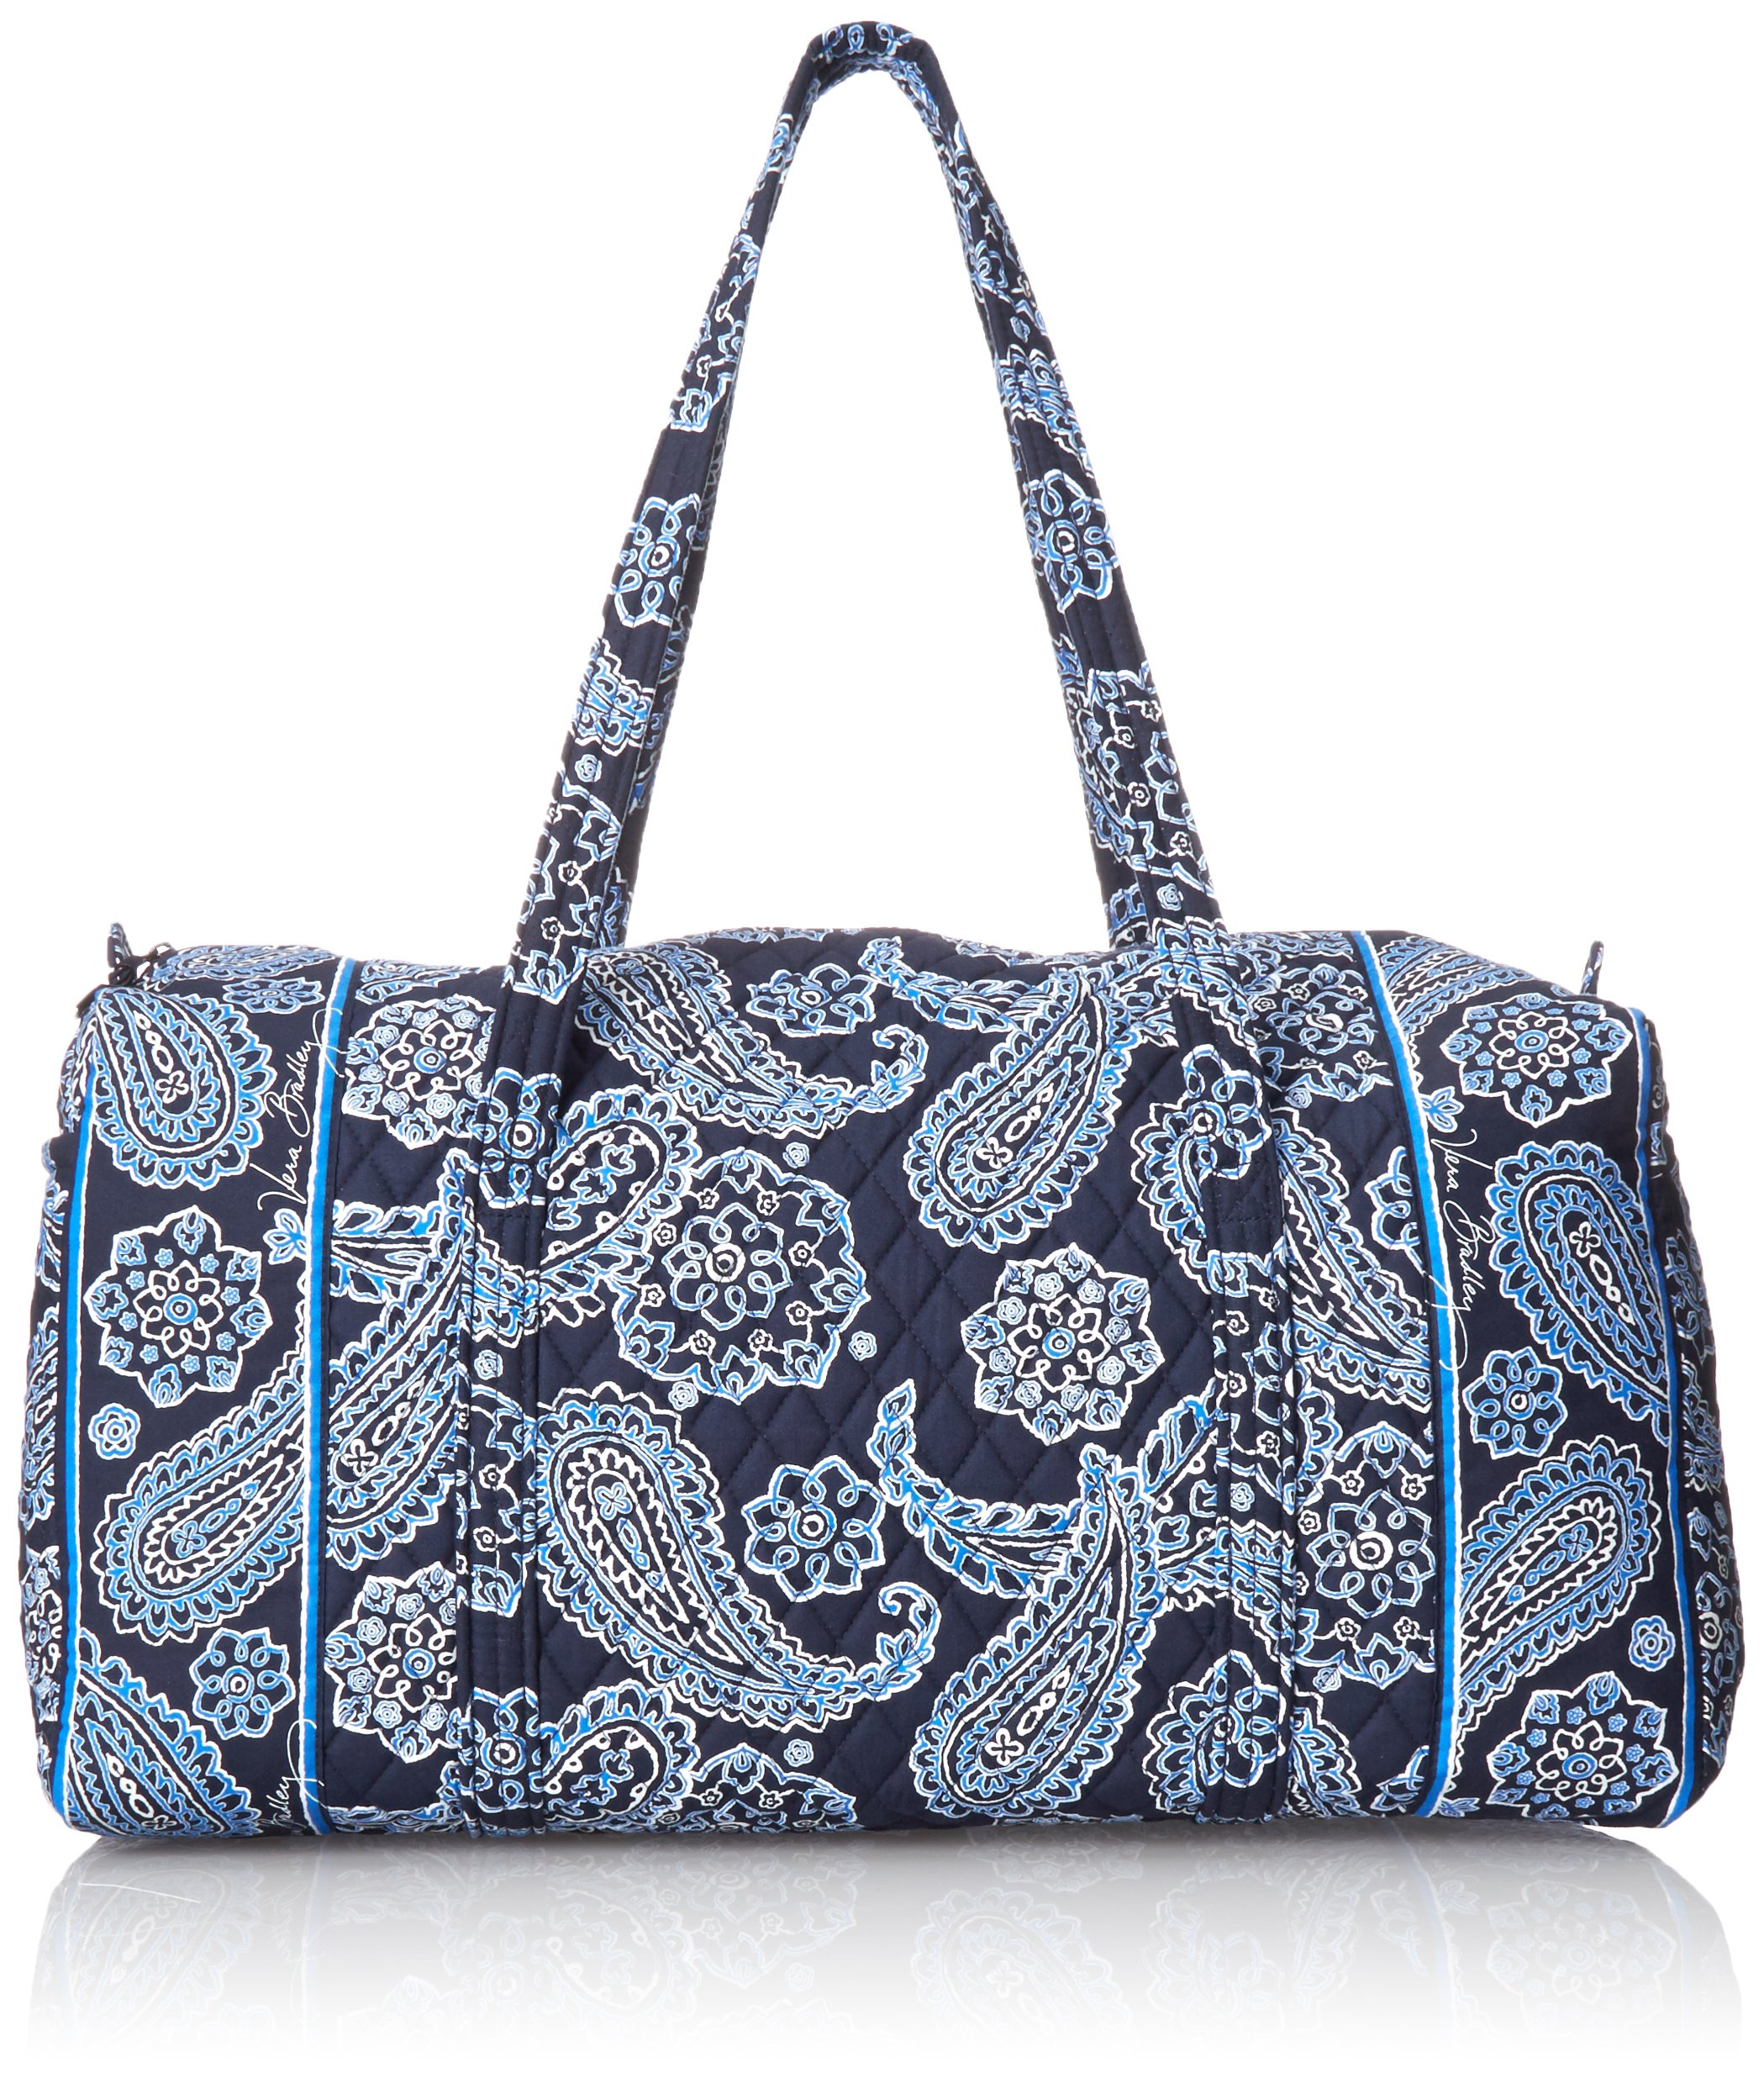 Women's Large Duffel, Signature Cotton, Blue Bandana